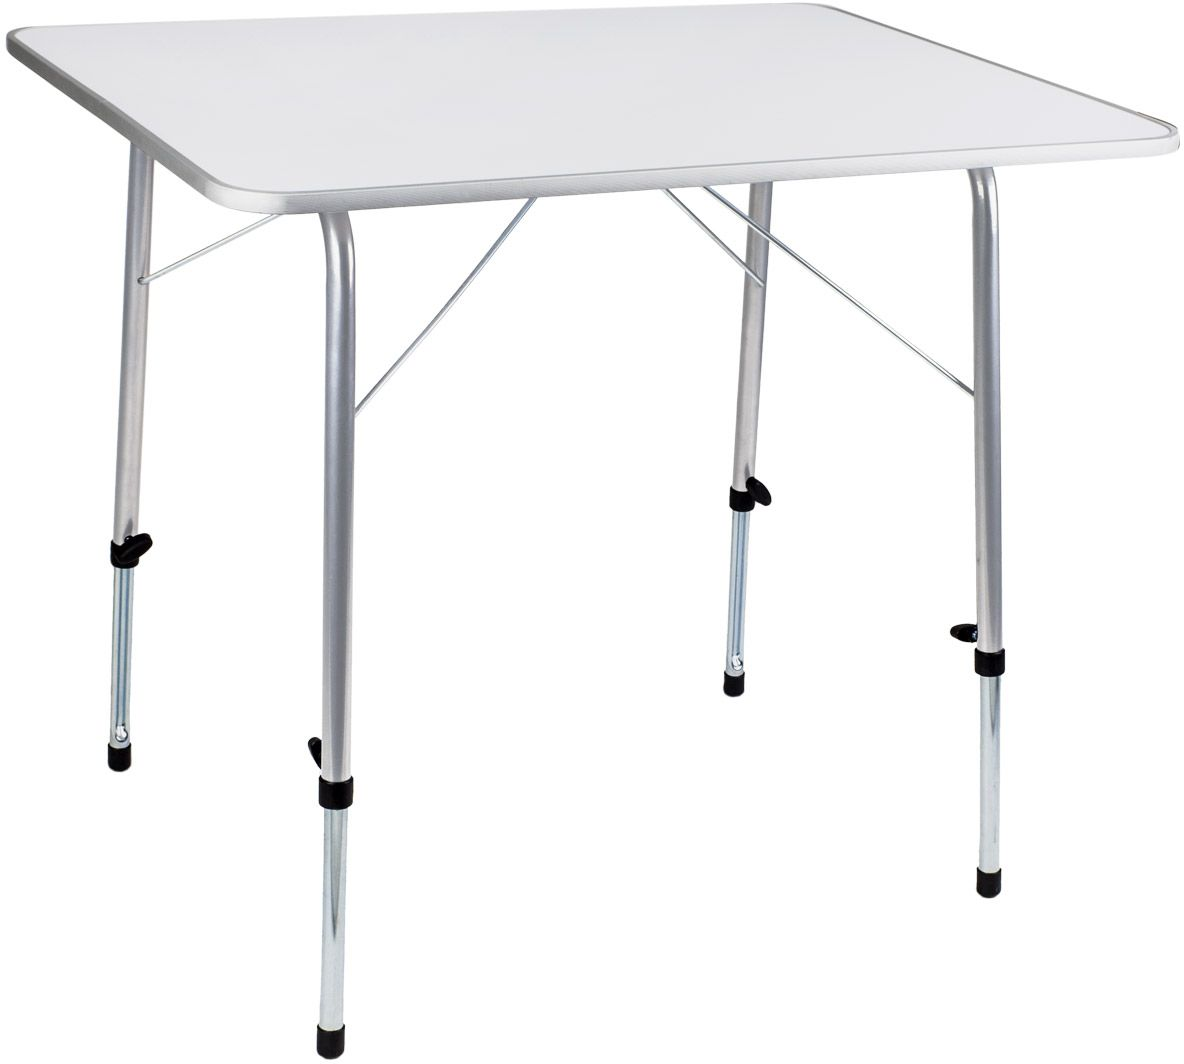 Стол складной TREK PLANET Picnic 80, кемпинговый, 81 х 6,5 х 62,5 см